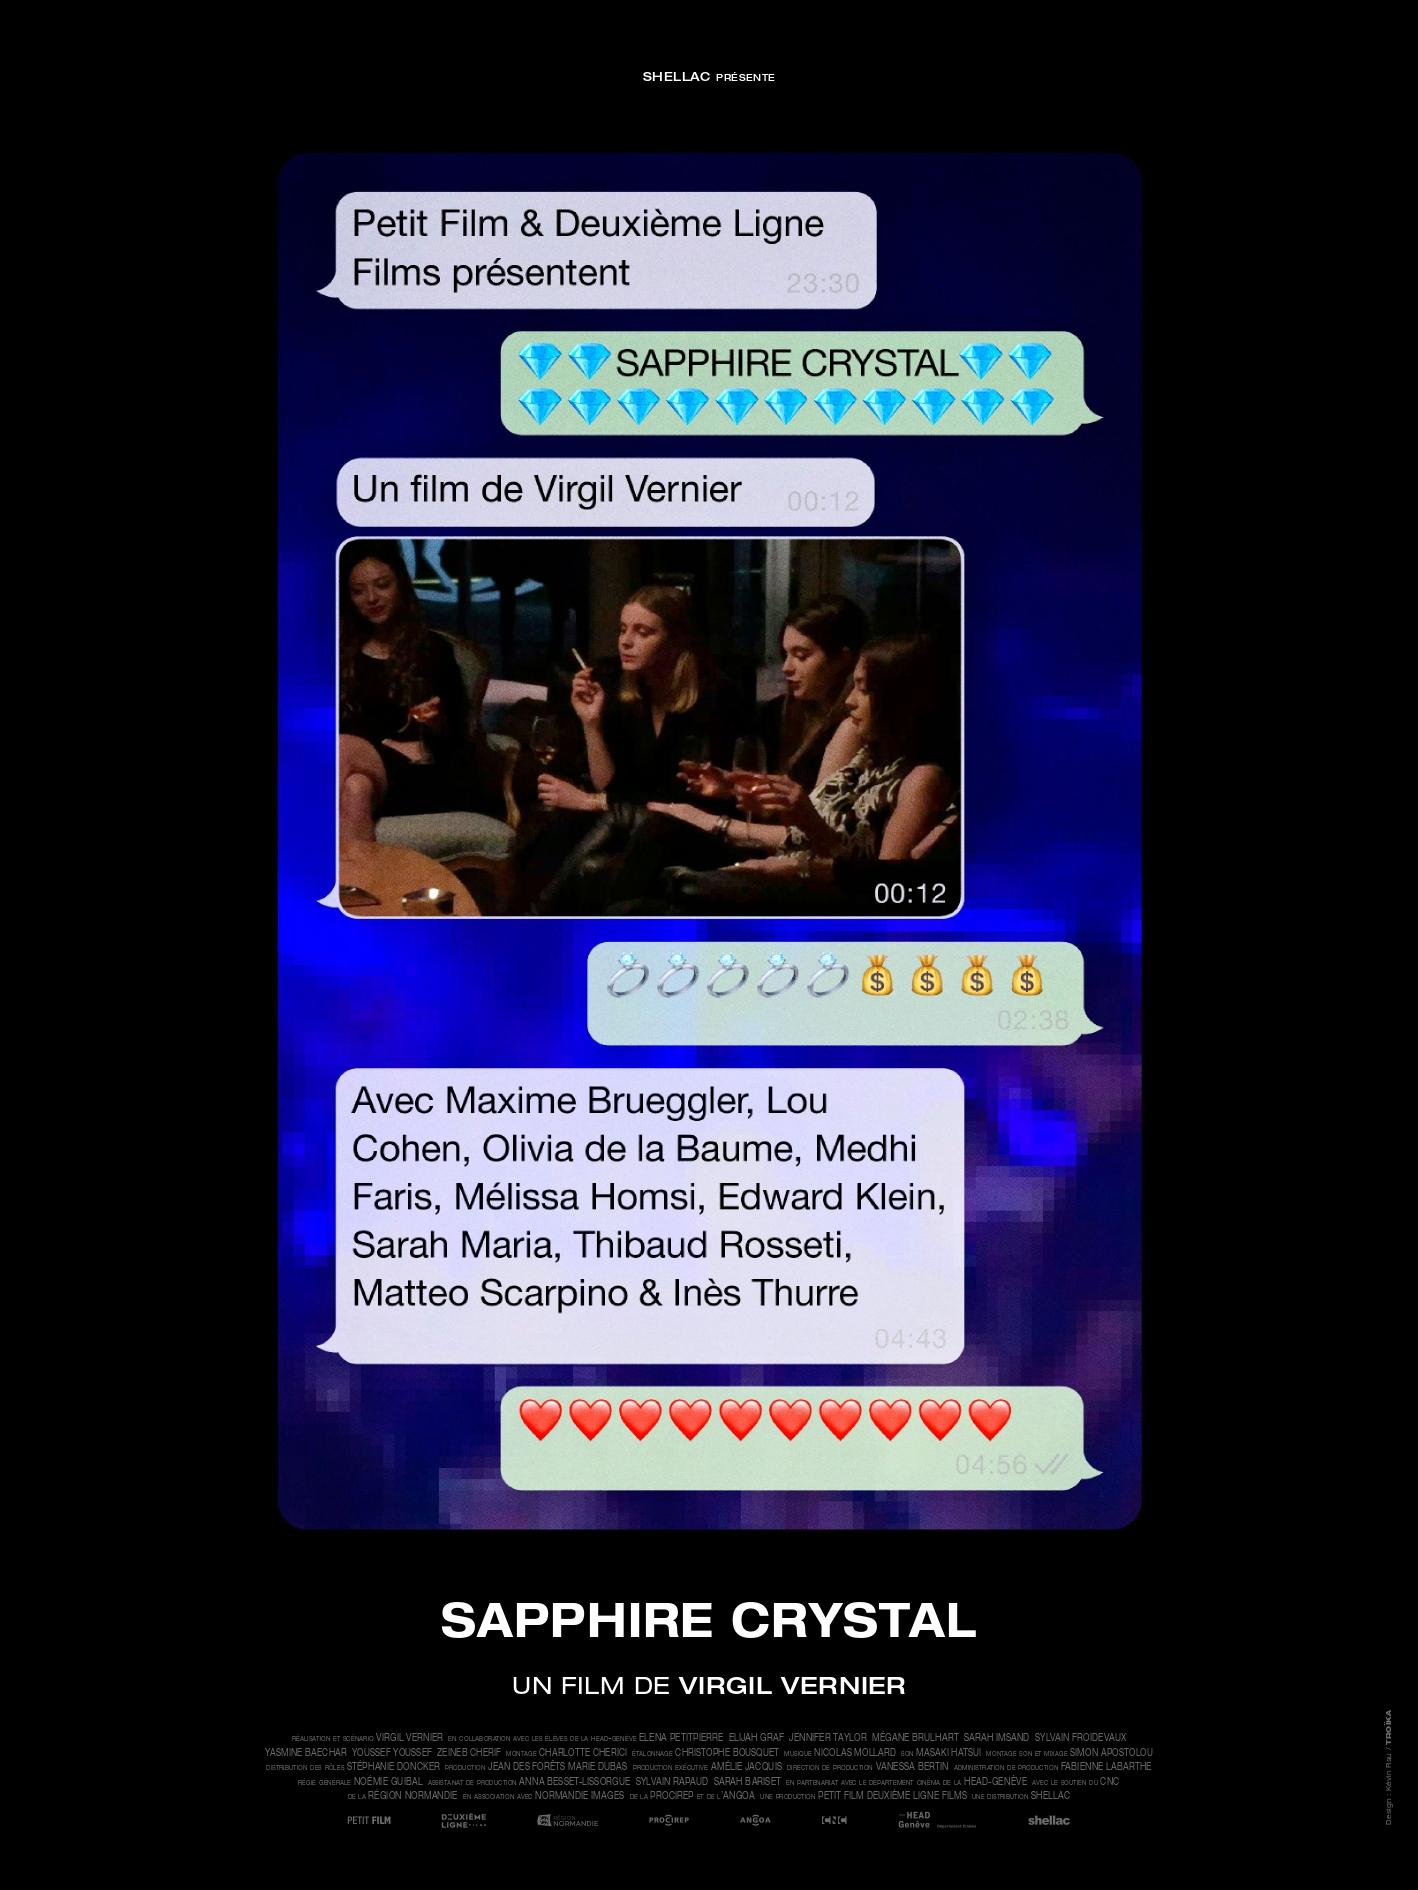 shellac-sapphire-crystal-image-3069-copyright-shellac.jpg